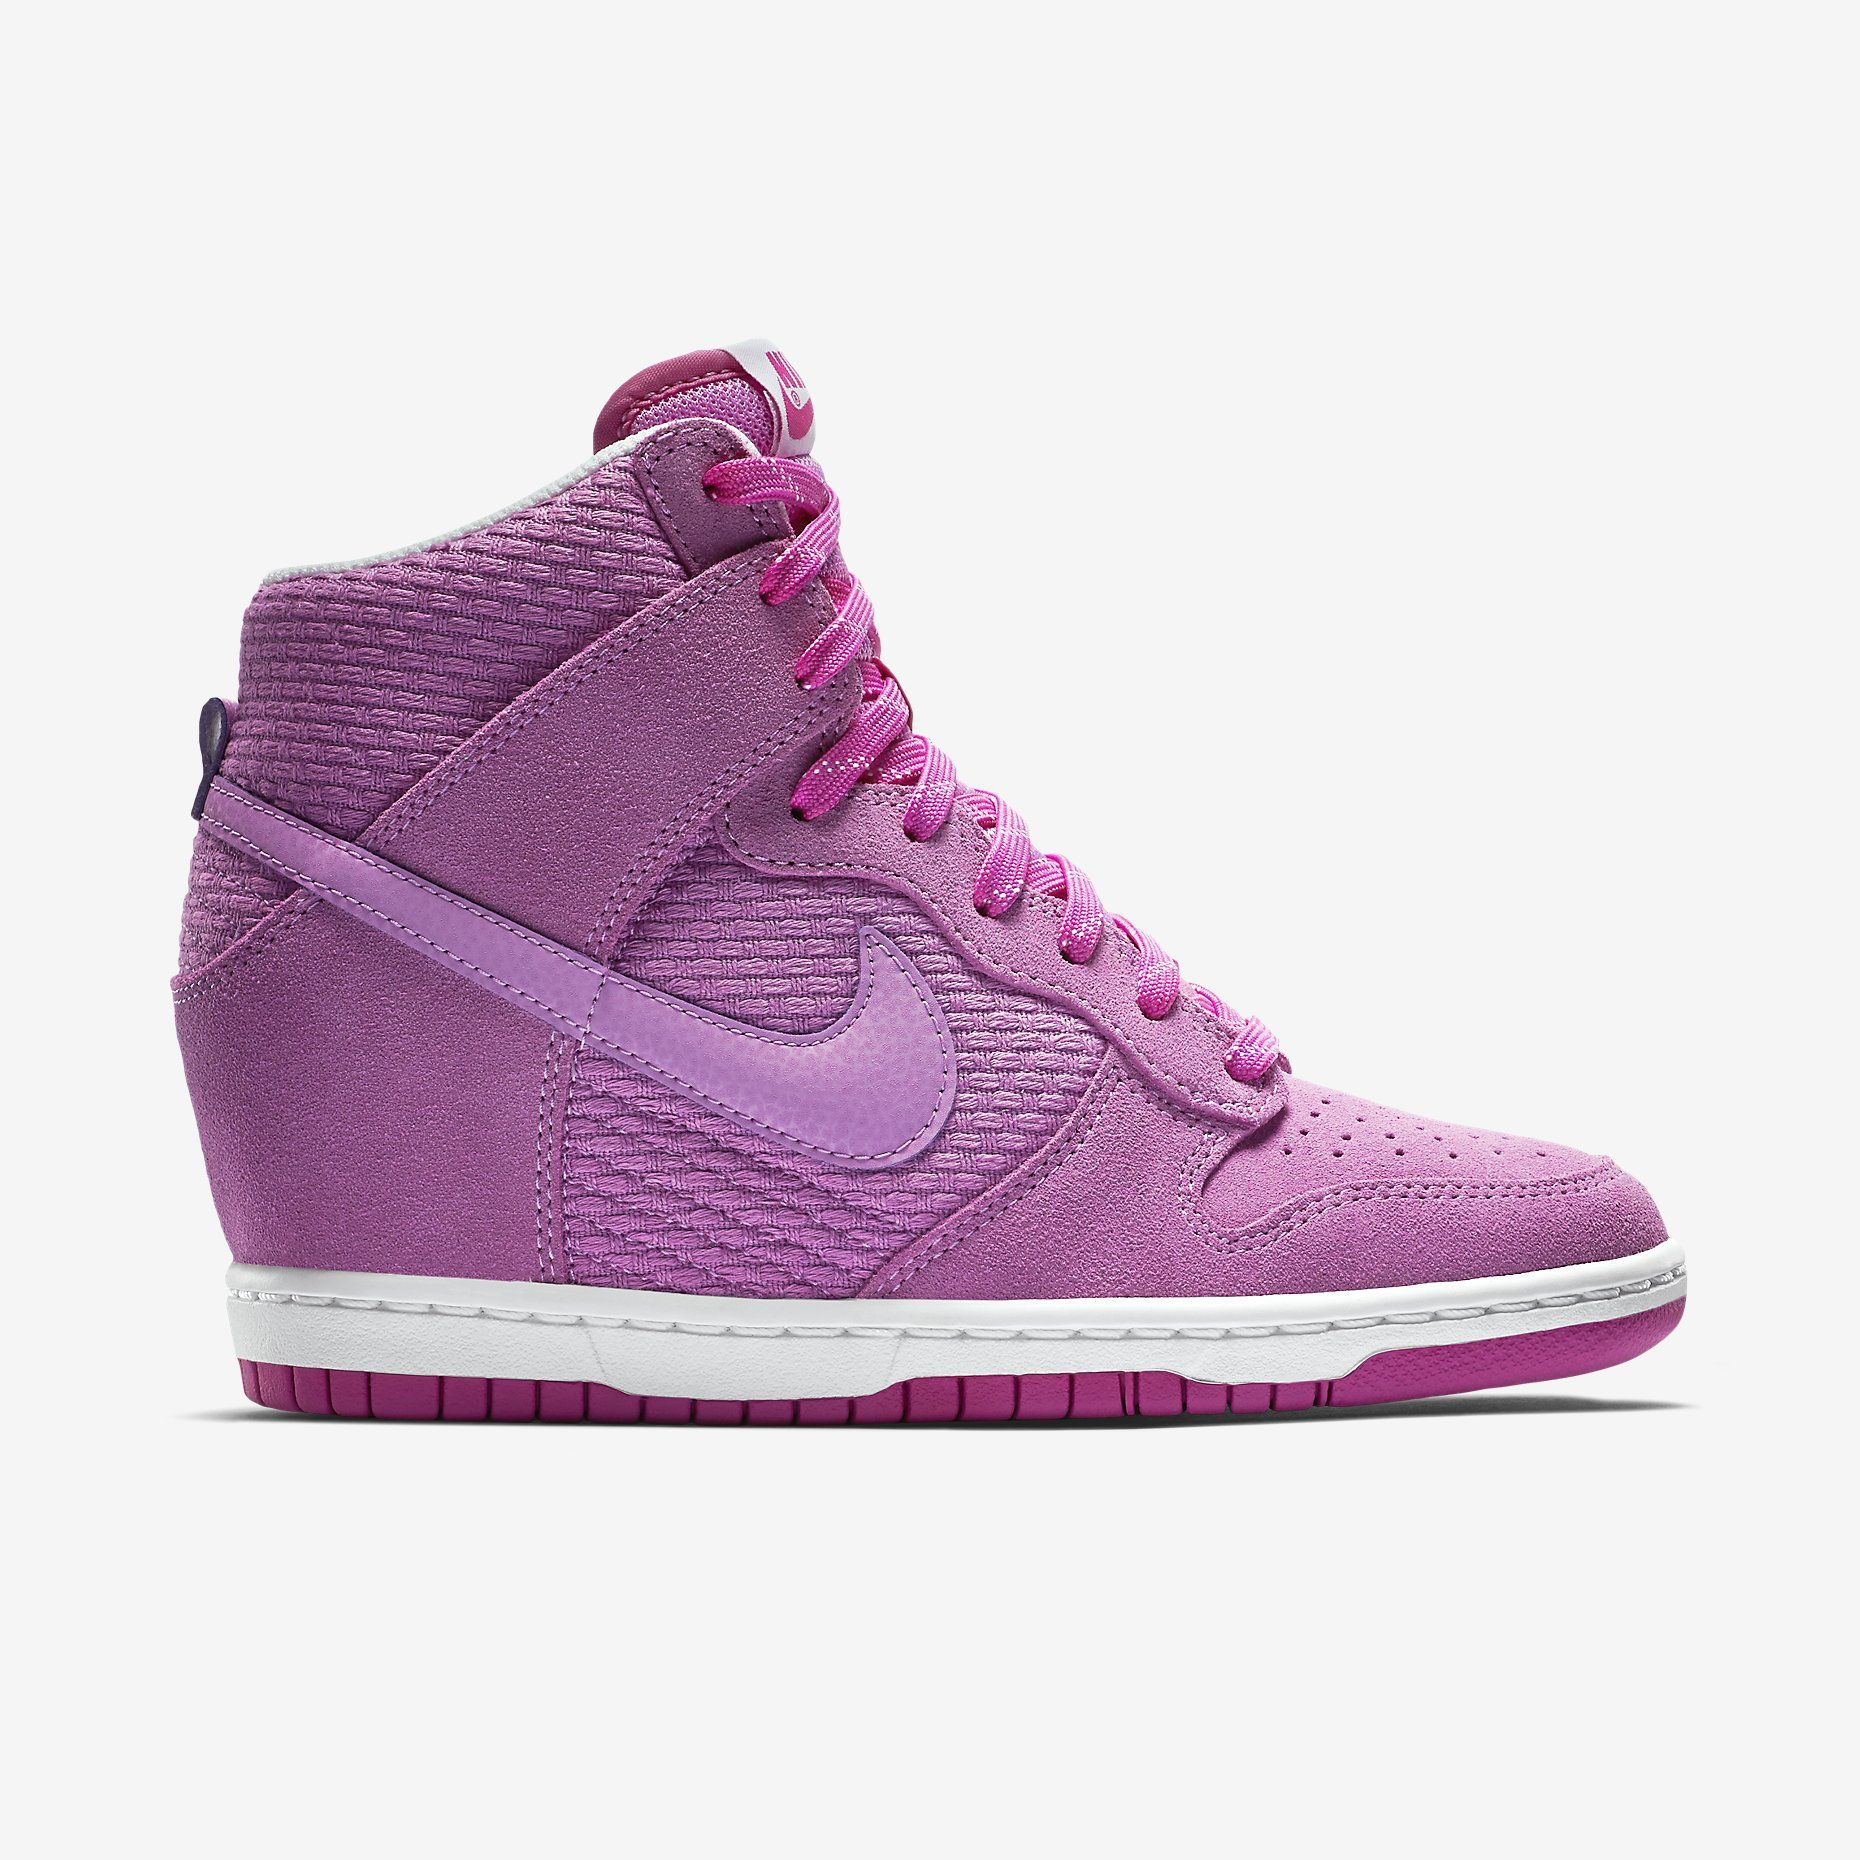 promo code 6bb58 89e02 Nike Dunk Sky Hi Essential Women s Shoe. Nike Store